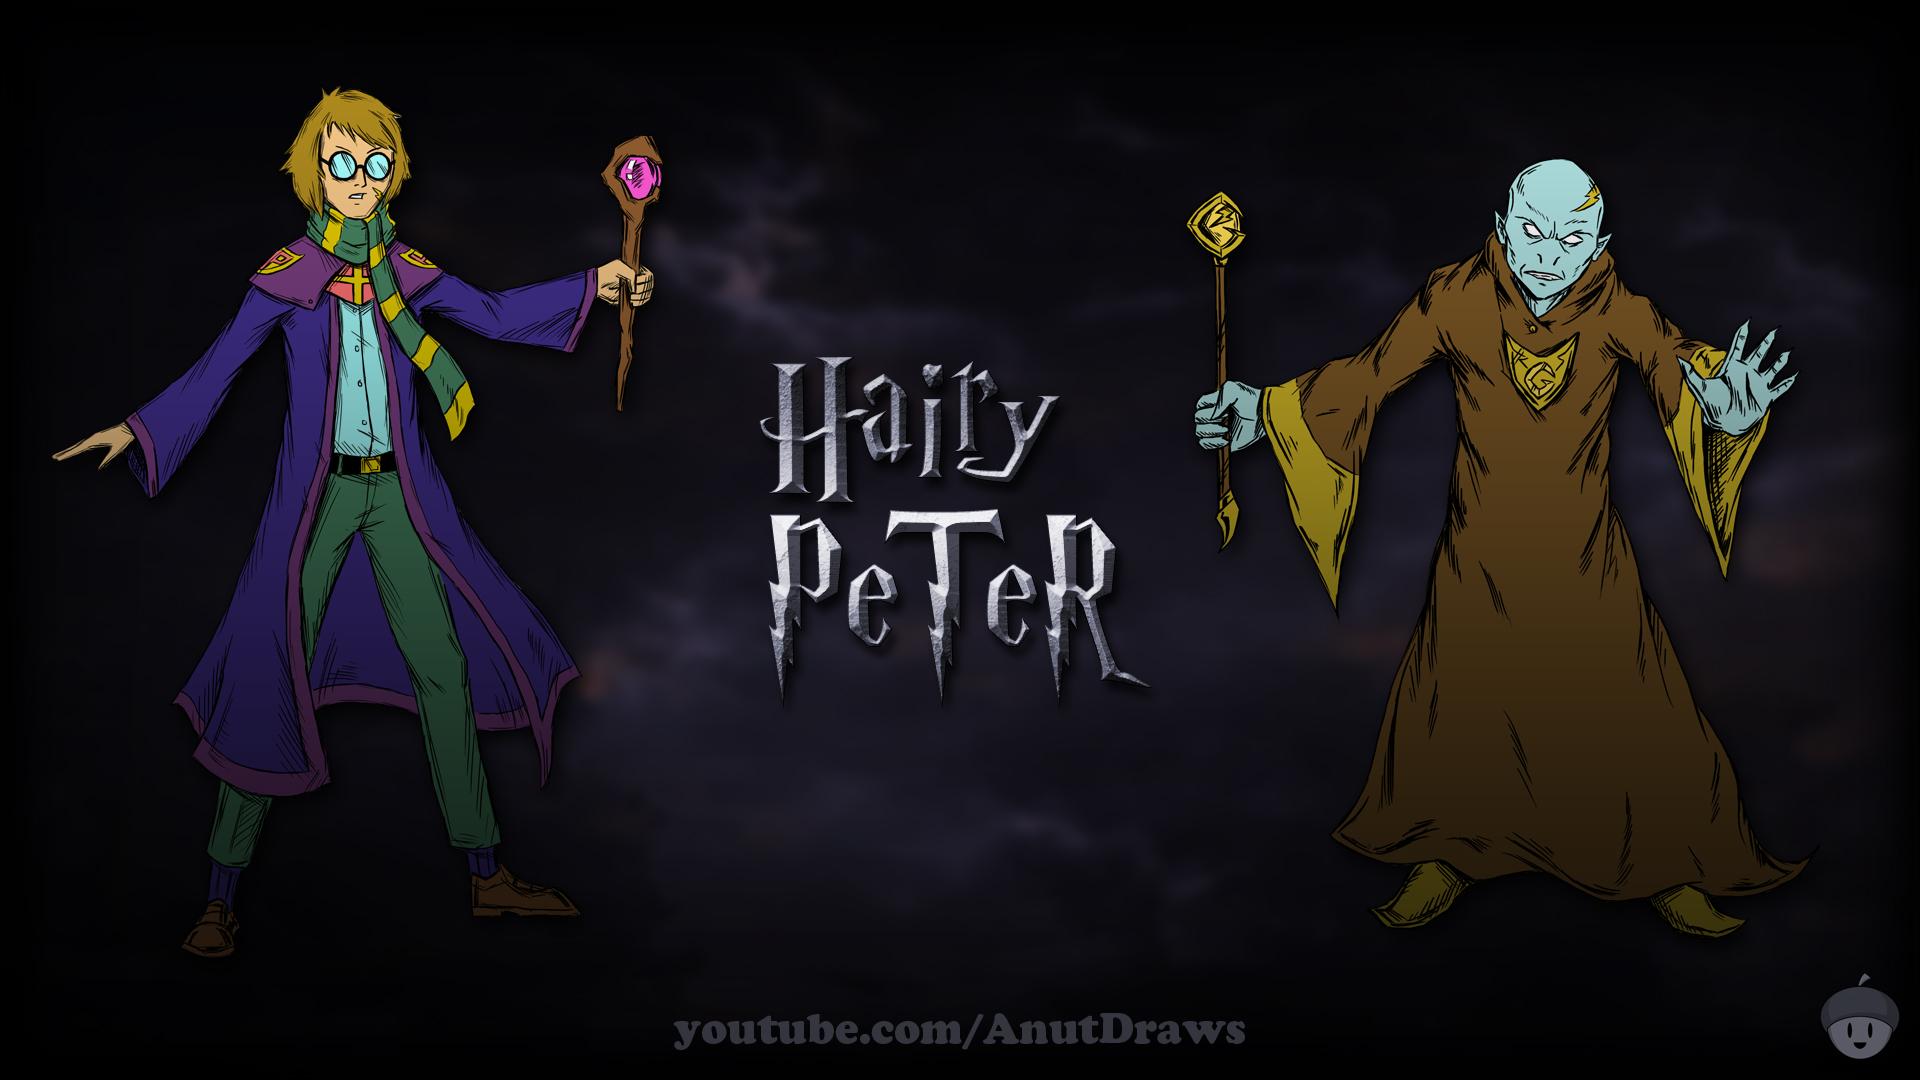 Hairy Peter